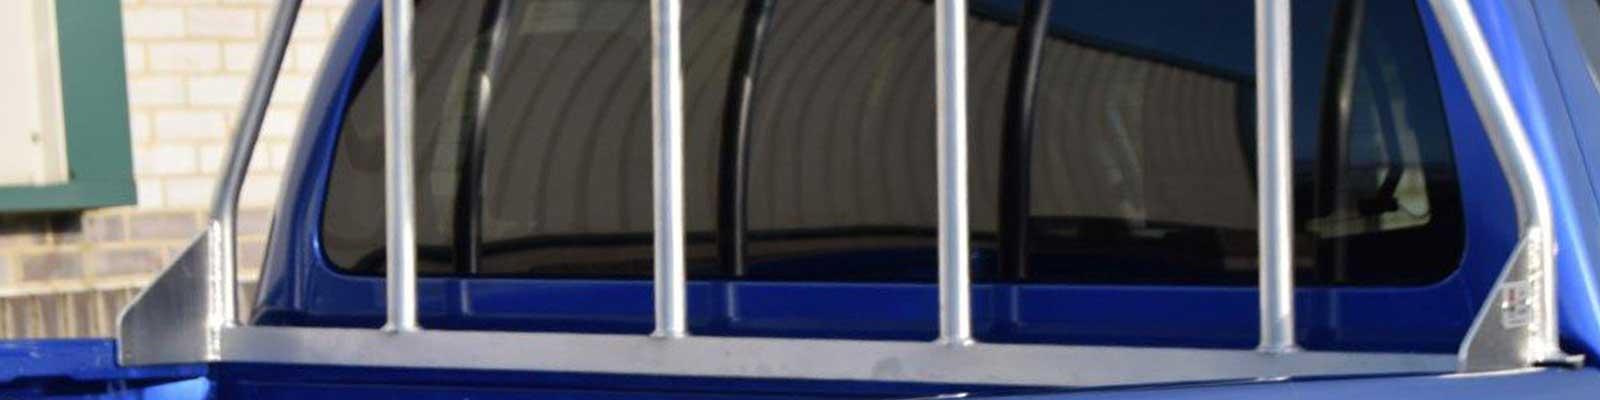 Ladder Rack Cab Guards